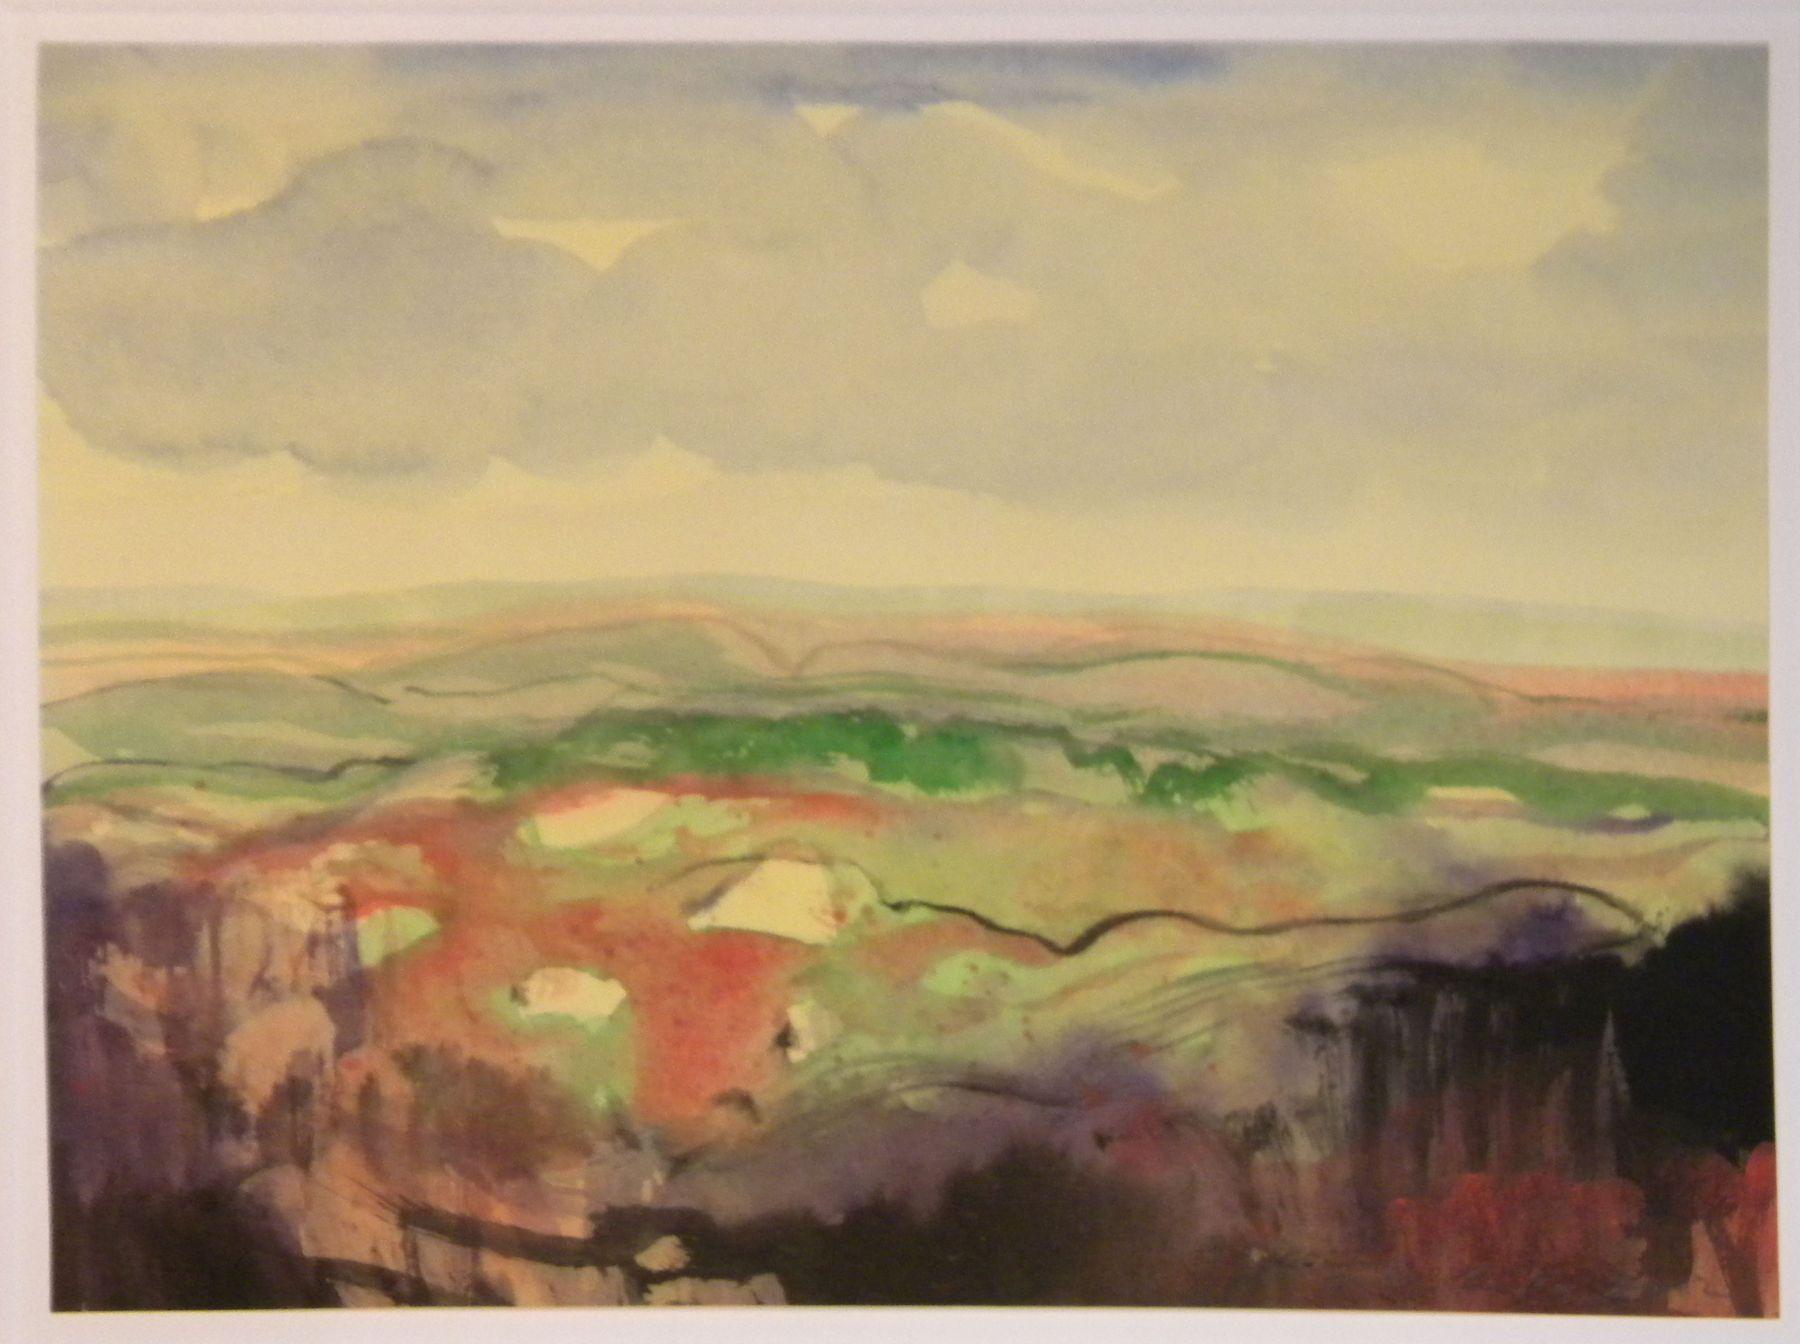 Fulvio Testa, Untitled 26, 2012    Watercolor on paper 9 5/8 x 13 1/4 inches